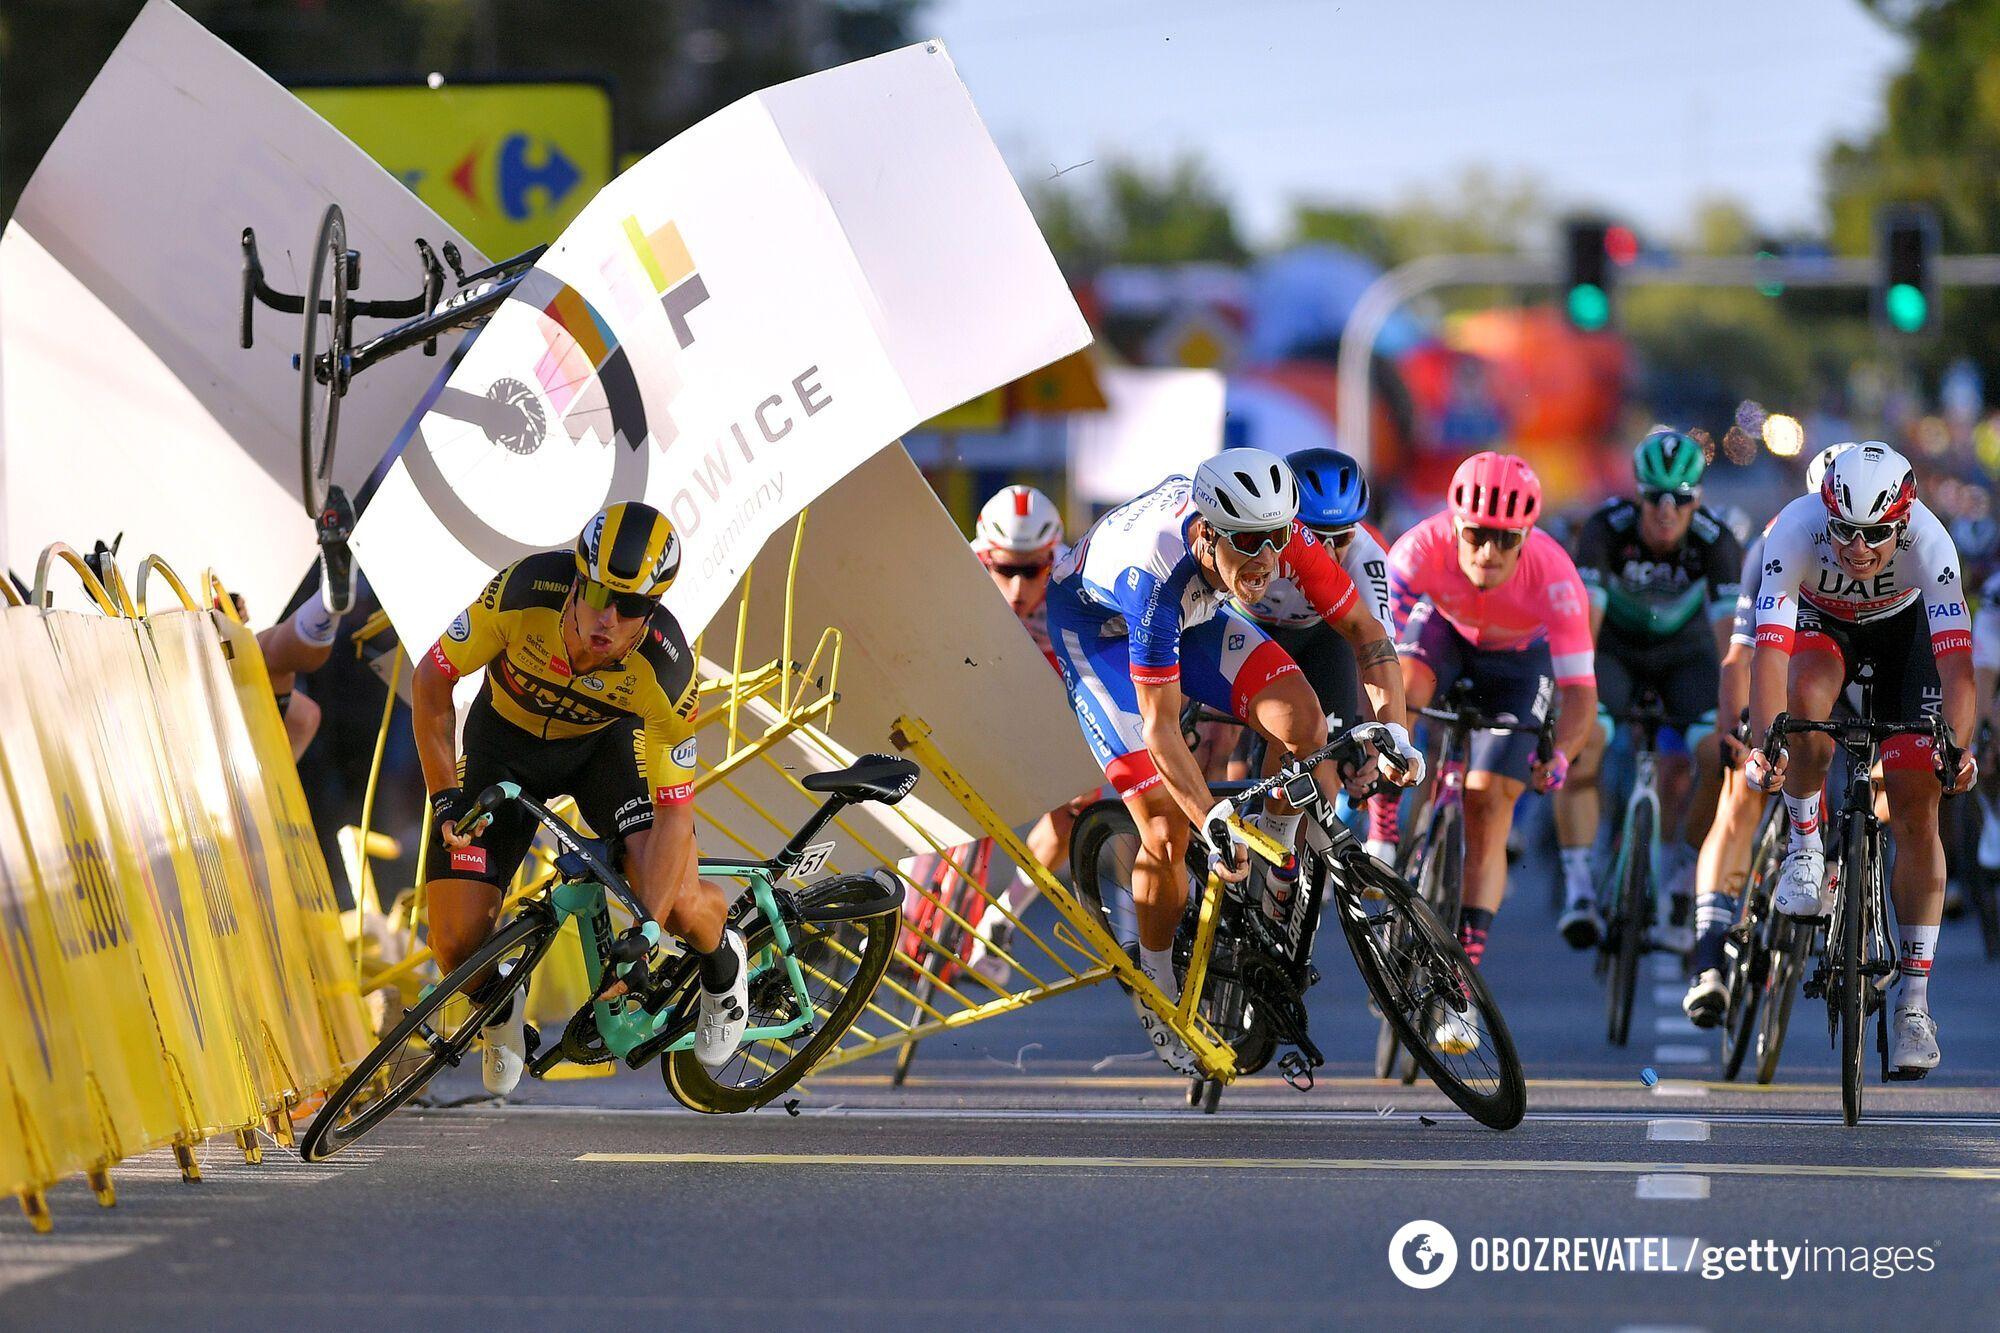 Велогонка Тур Польши: момент аварии на финише